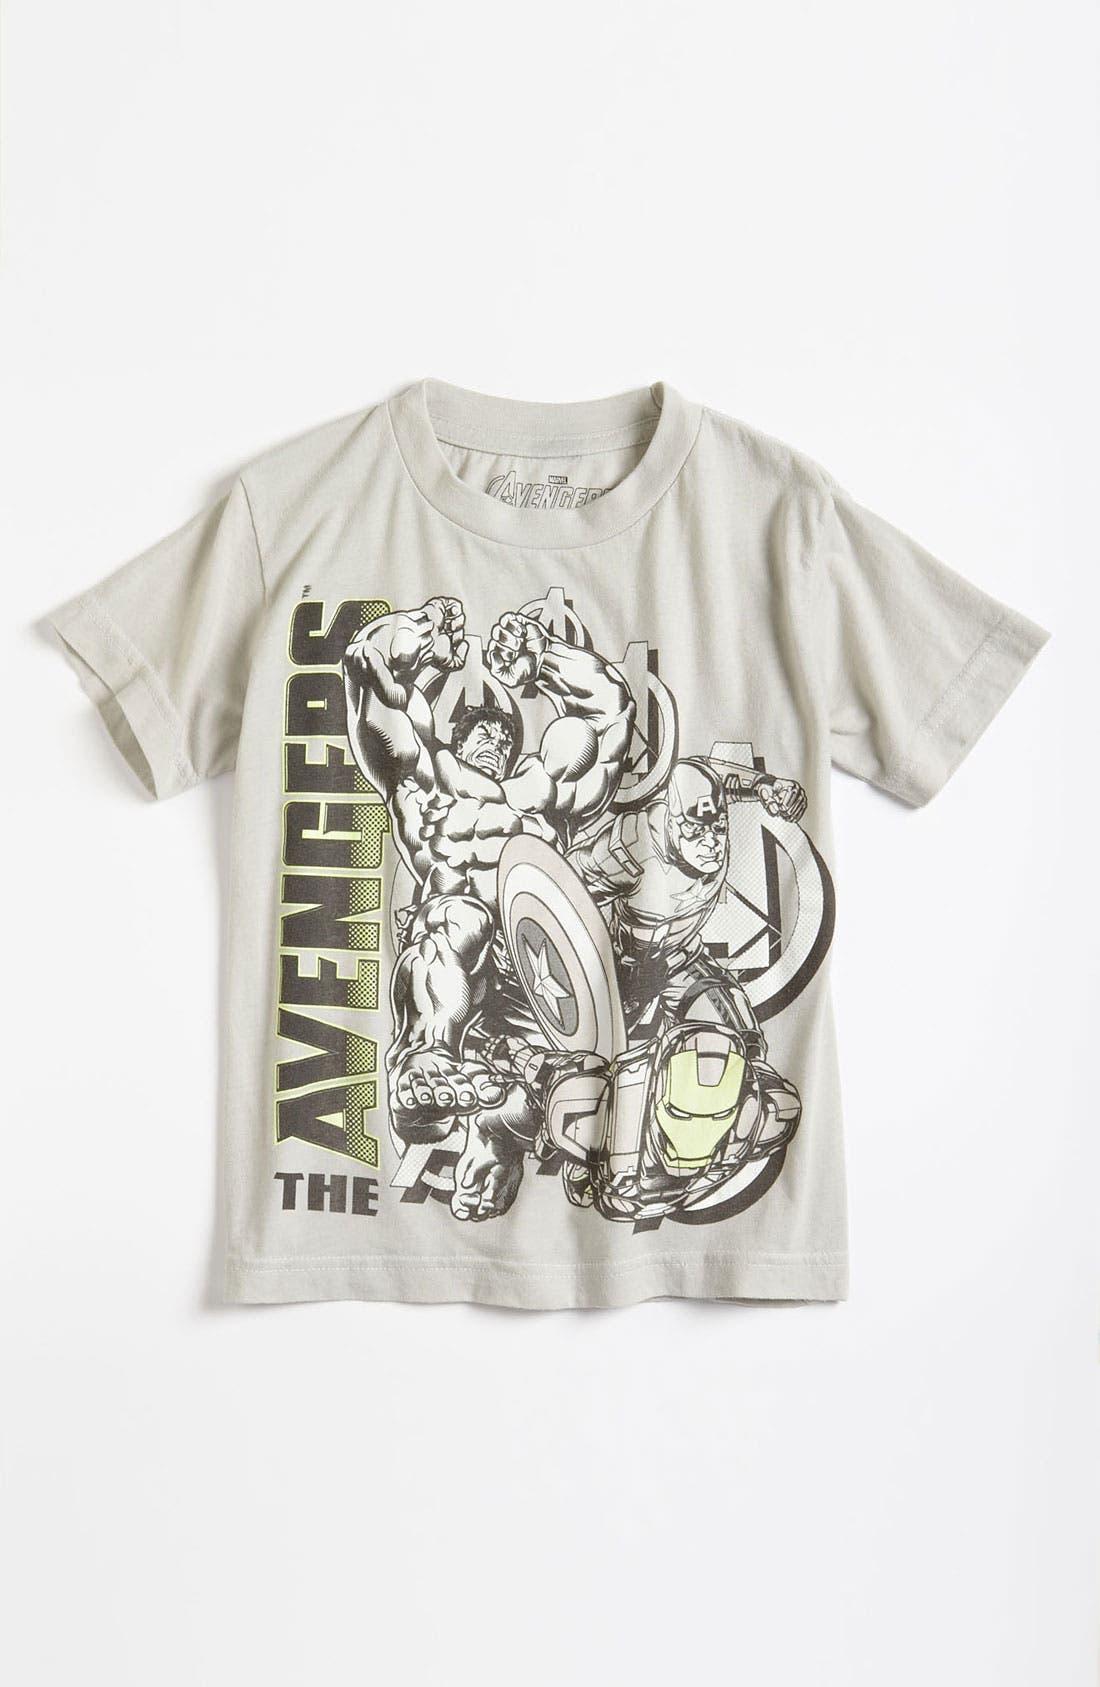 Main Image - Jem 'The Avengers™' Glow in the Dark T-Shirt (Little Boys)